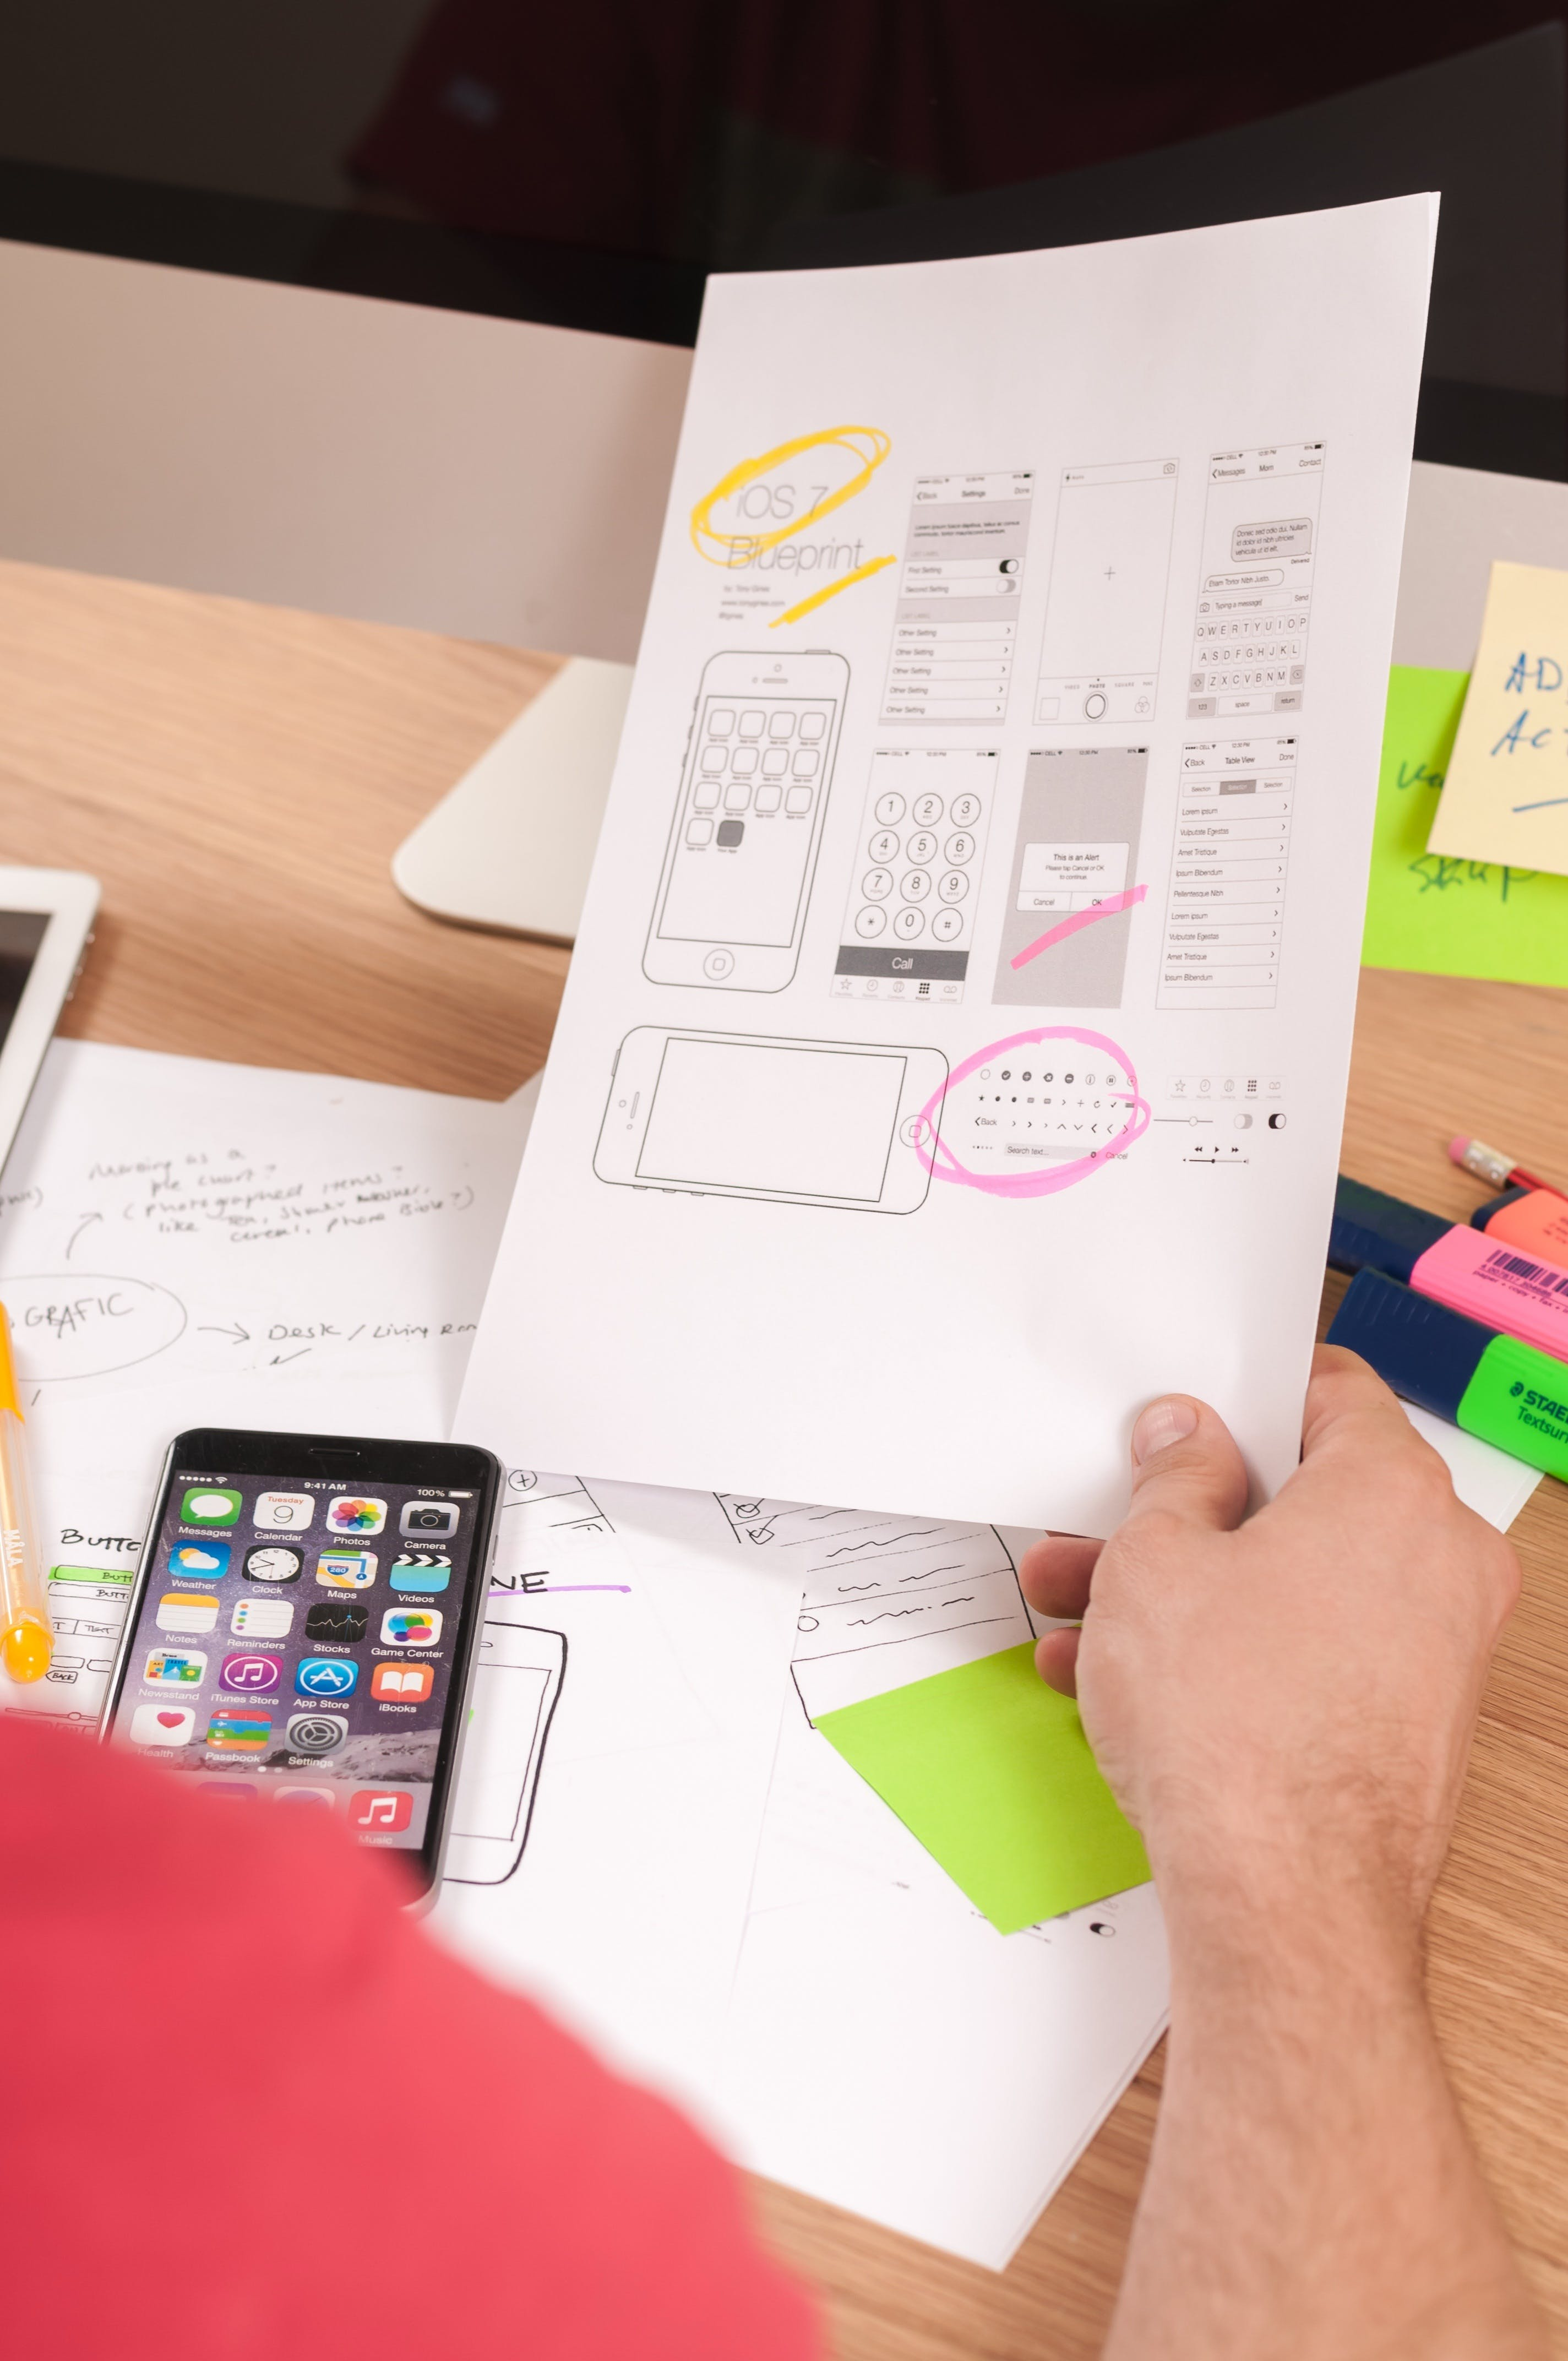 Free stock photo of marketing, menu, creative, apple